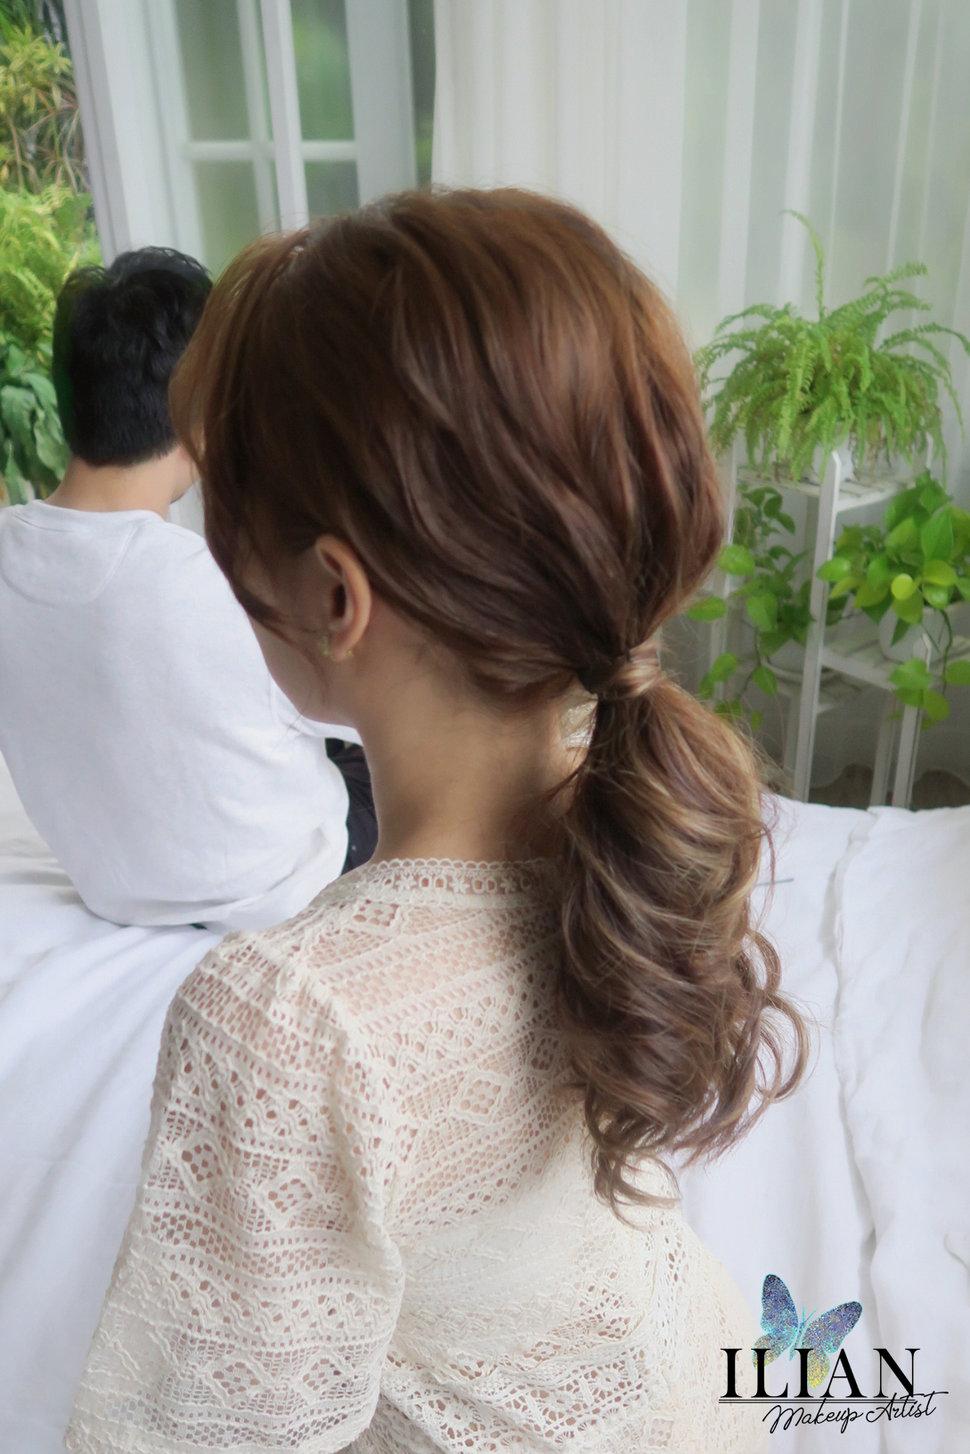 20191126095949_mh1574858598773 - ilian藍專業彩妝造型《結婚吧》